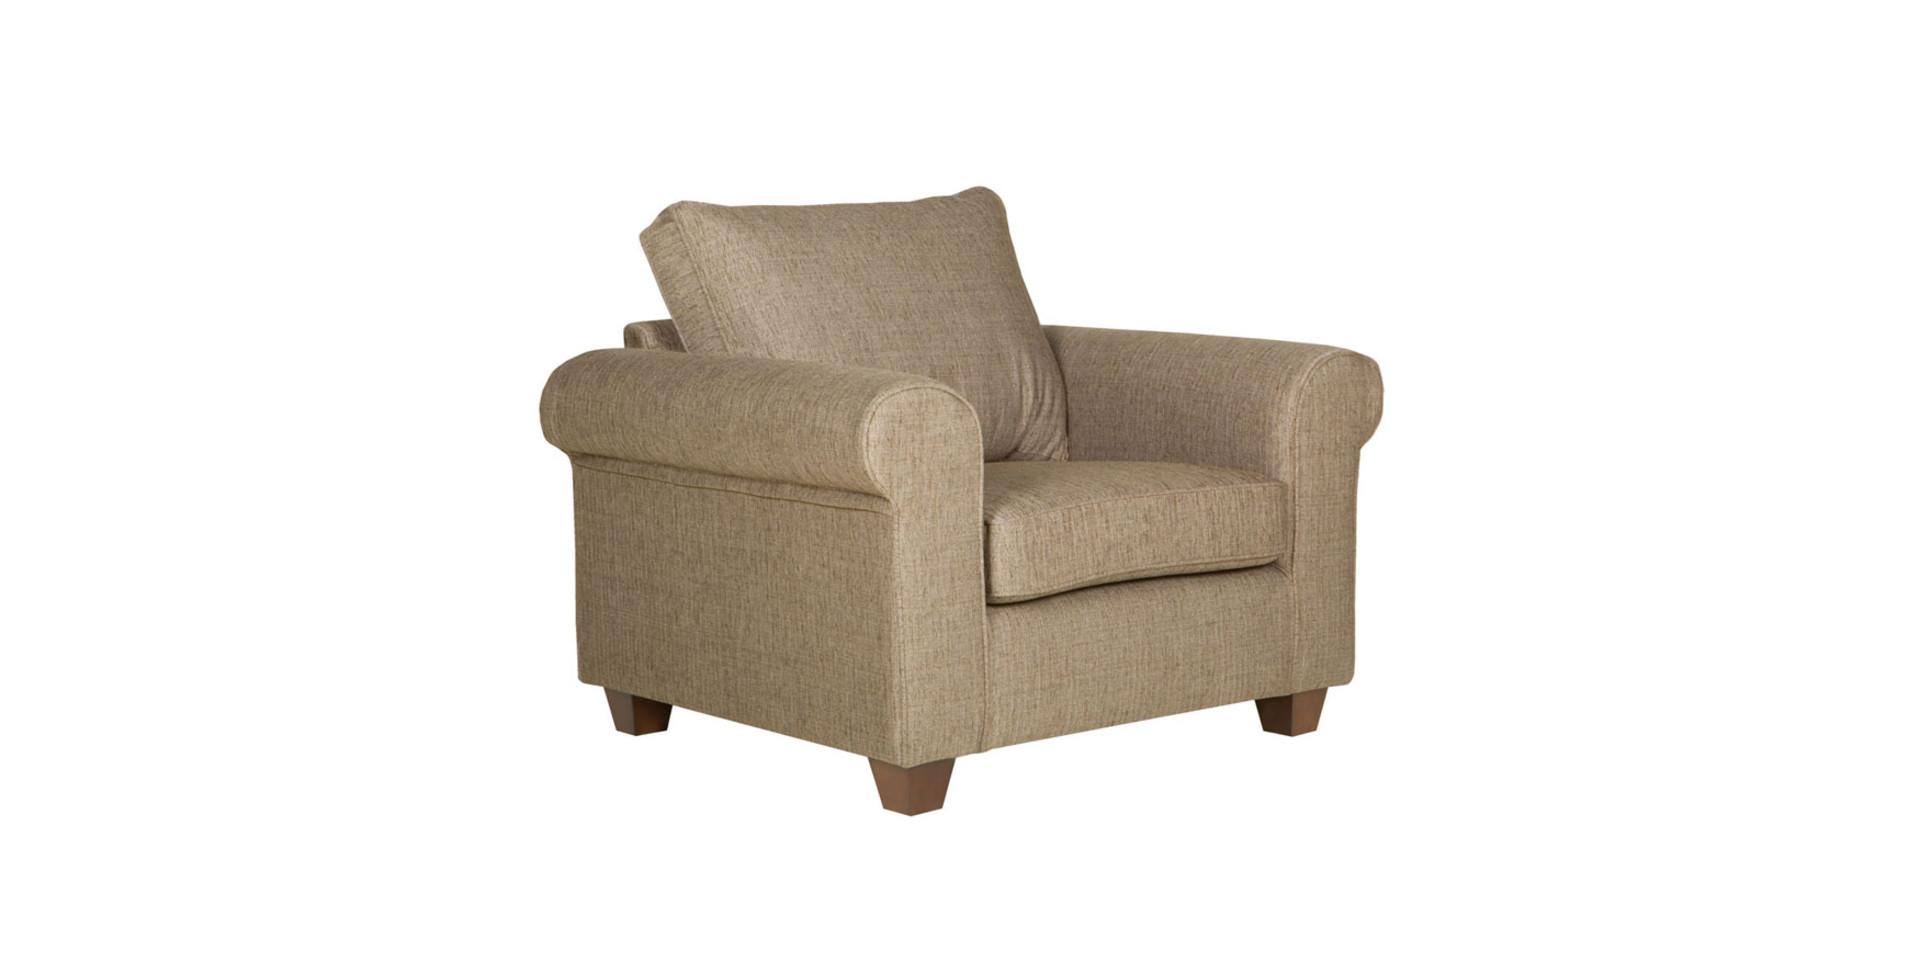 sits-romantic-fauteuil-armchair_veraam4b1_brown_grey_2